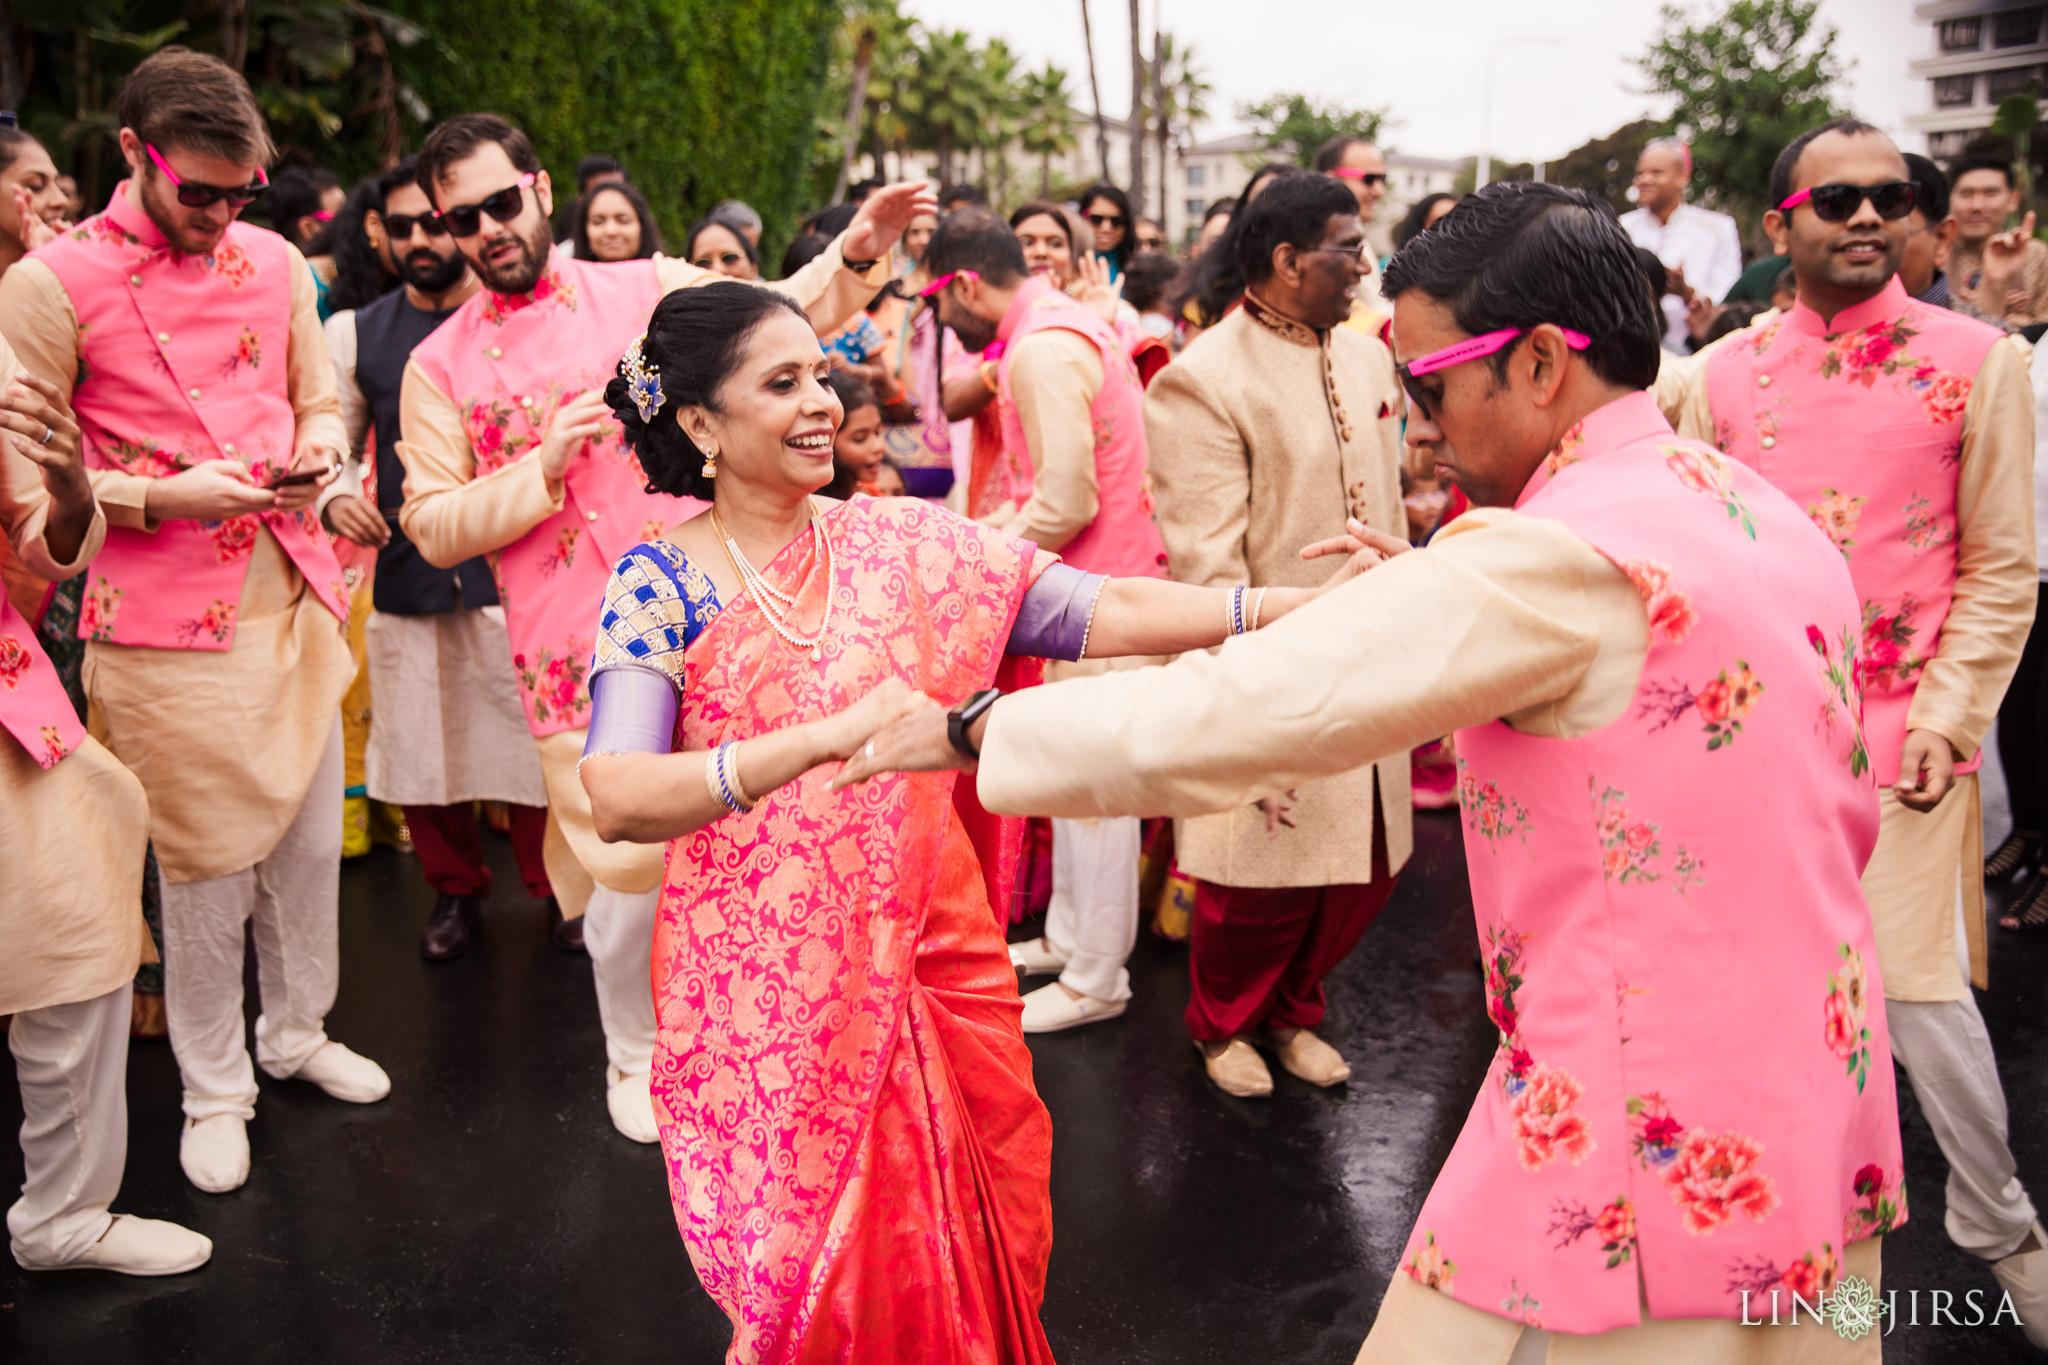 10 newport beach indian wedding photographer